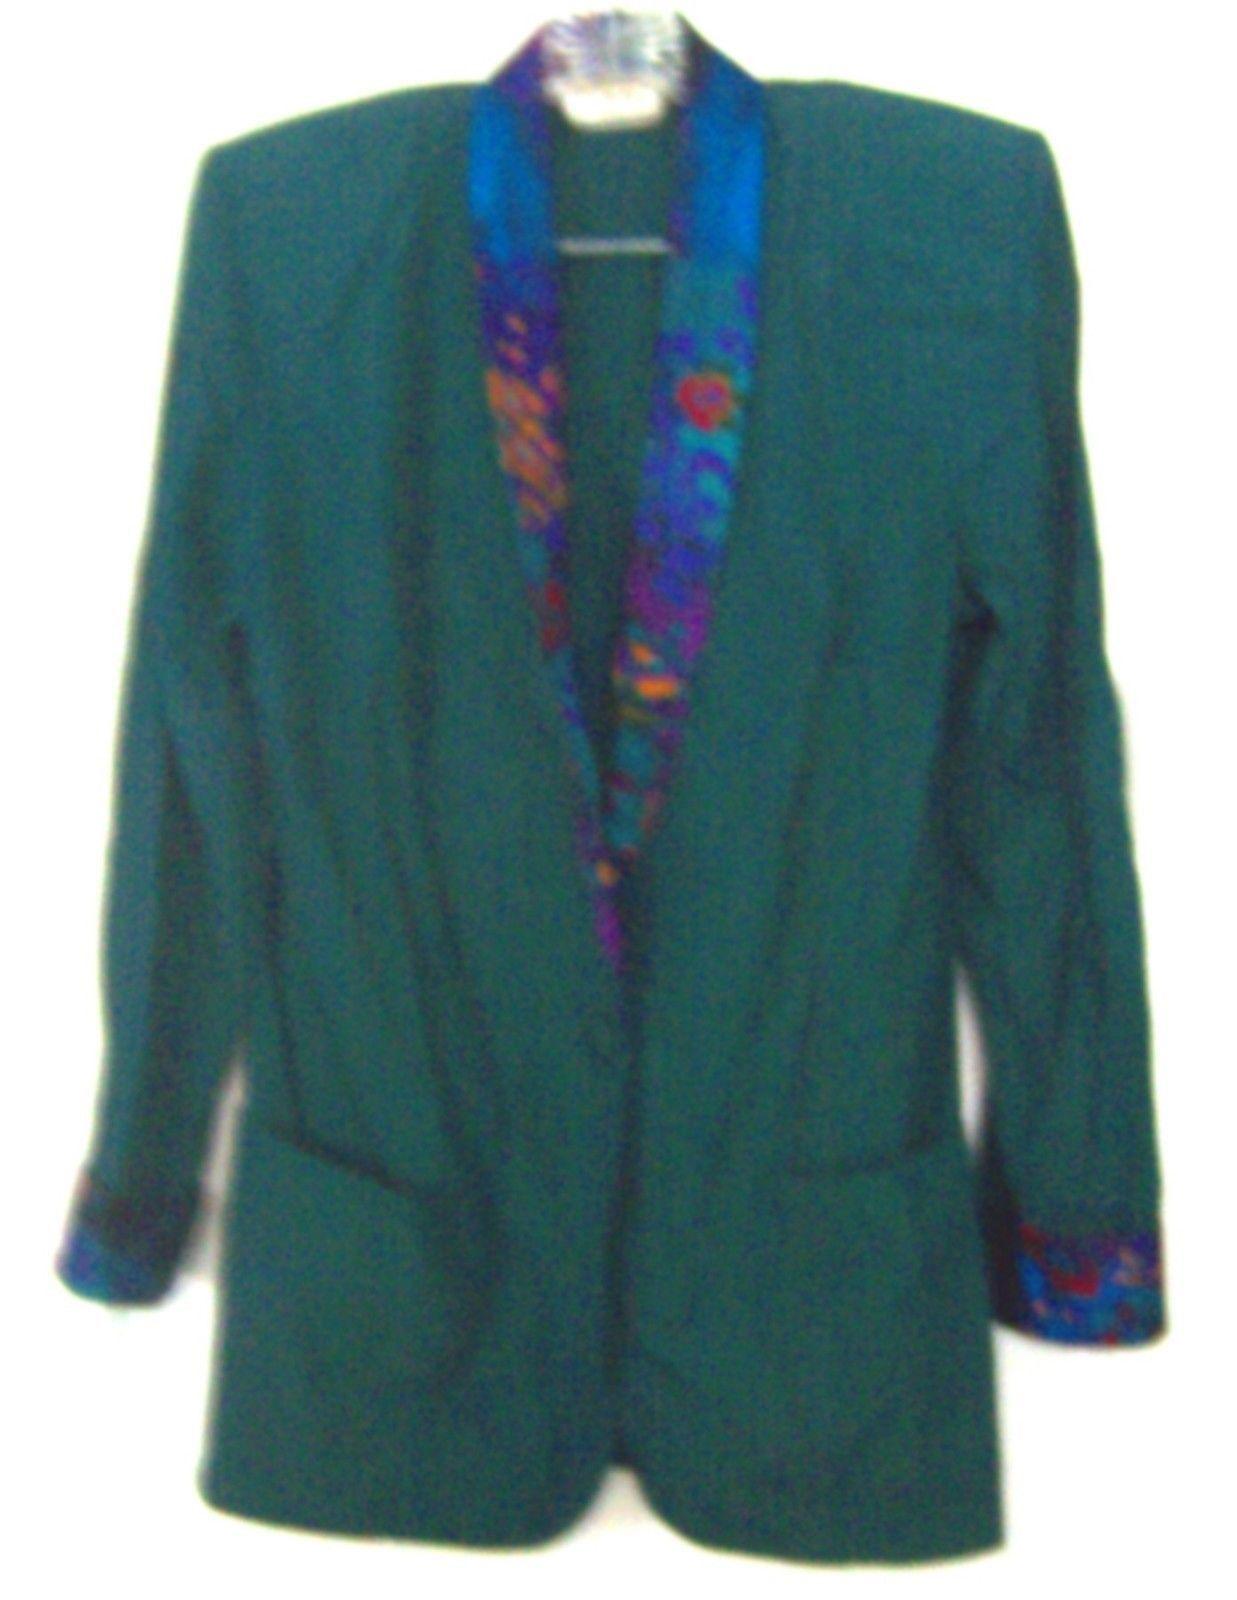 Synari Hunter Green Business Suit Dress Jacket w/Floral Lapels  Sz Large - $18.99